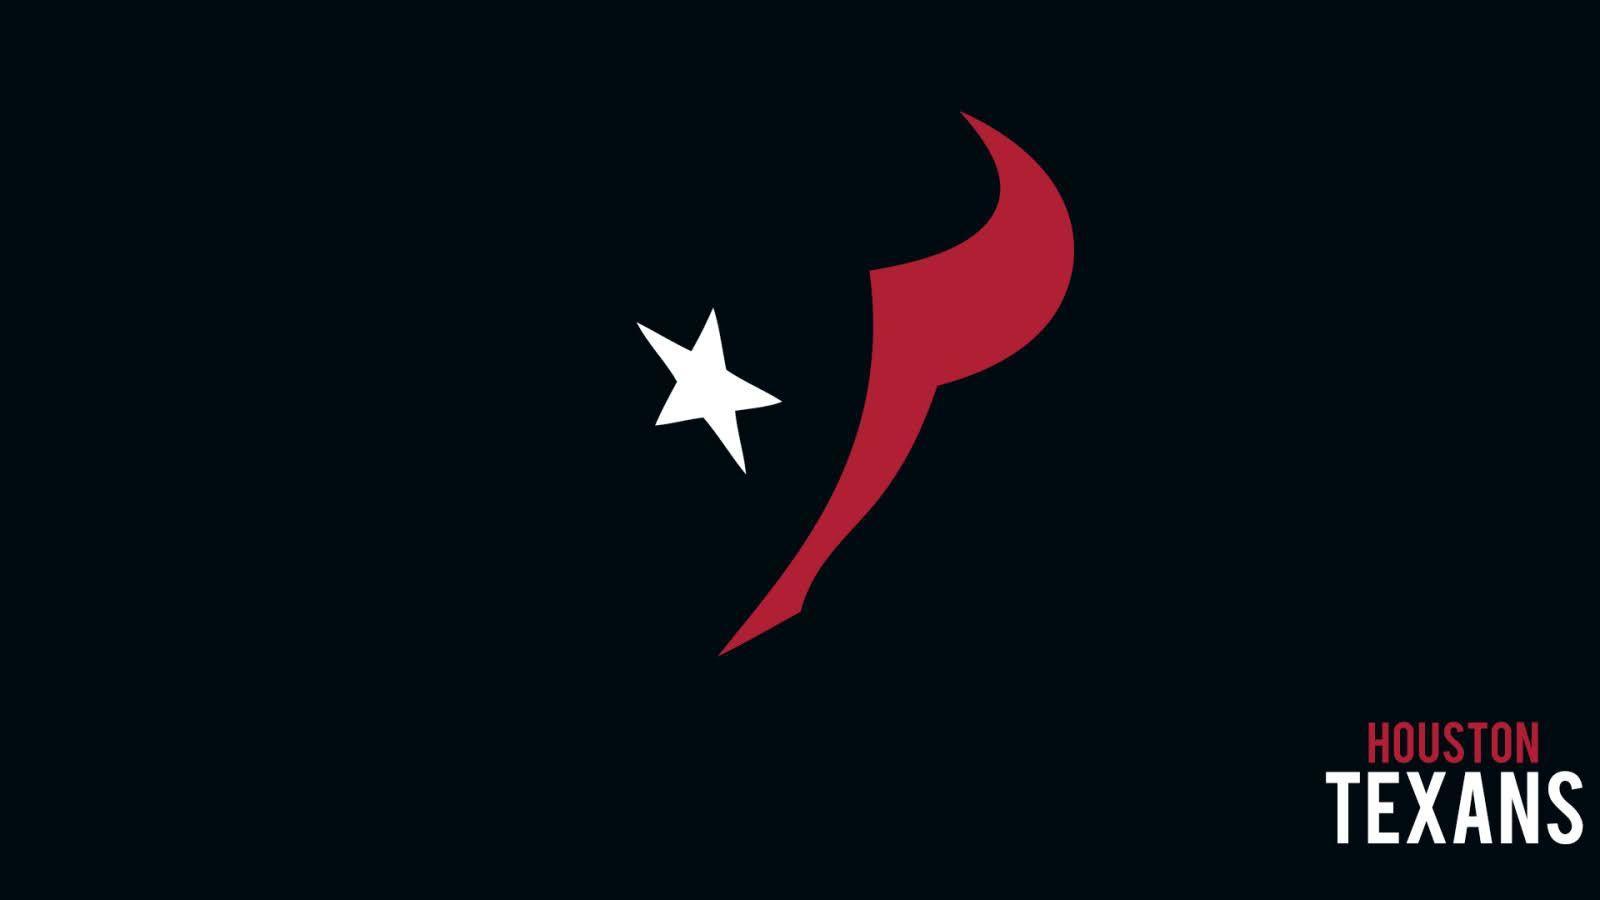 Houston Texans Nfl For Pc Wallpaper 2020 Nfl Football Wallpapers